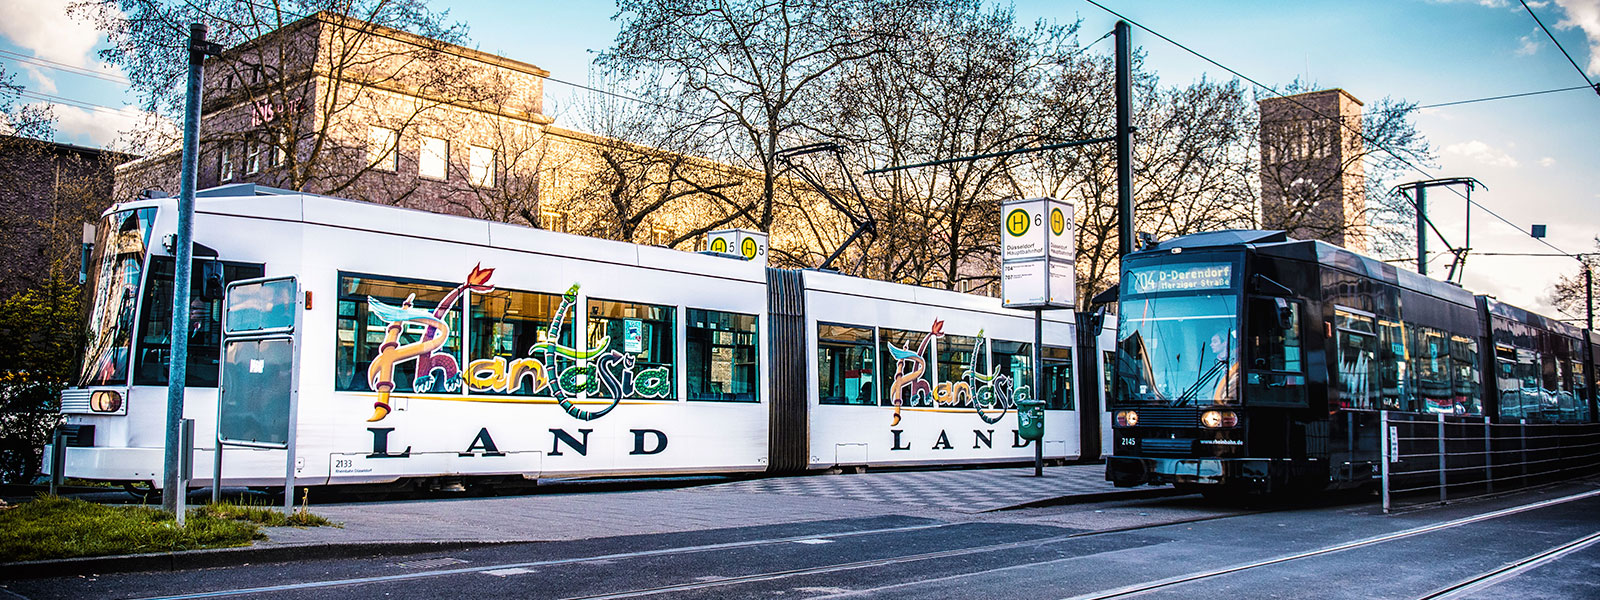 Hamburg-Verkehrsmittelwerbung-Bahn-Werbung